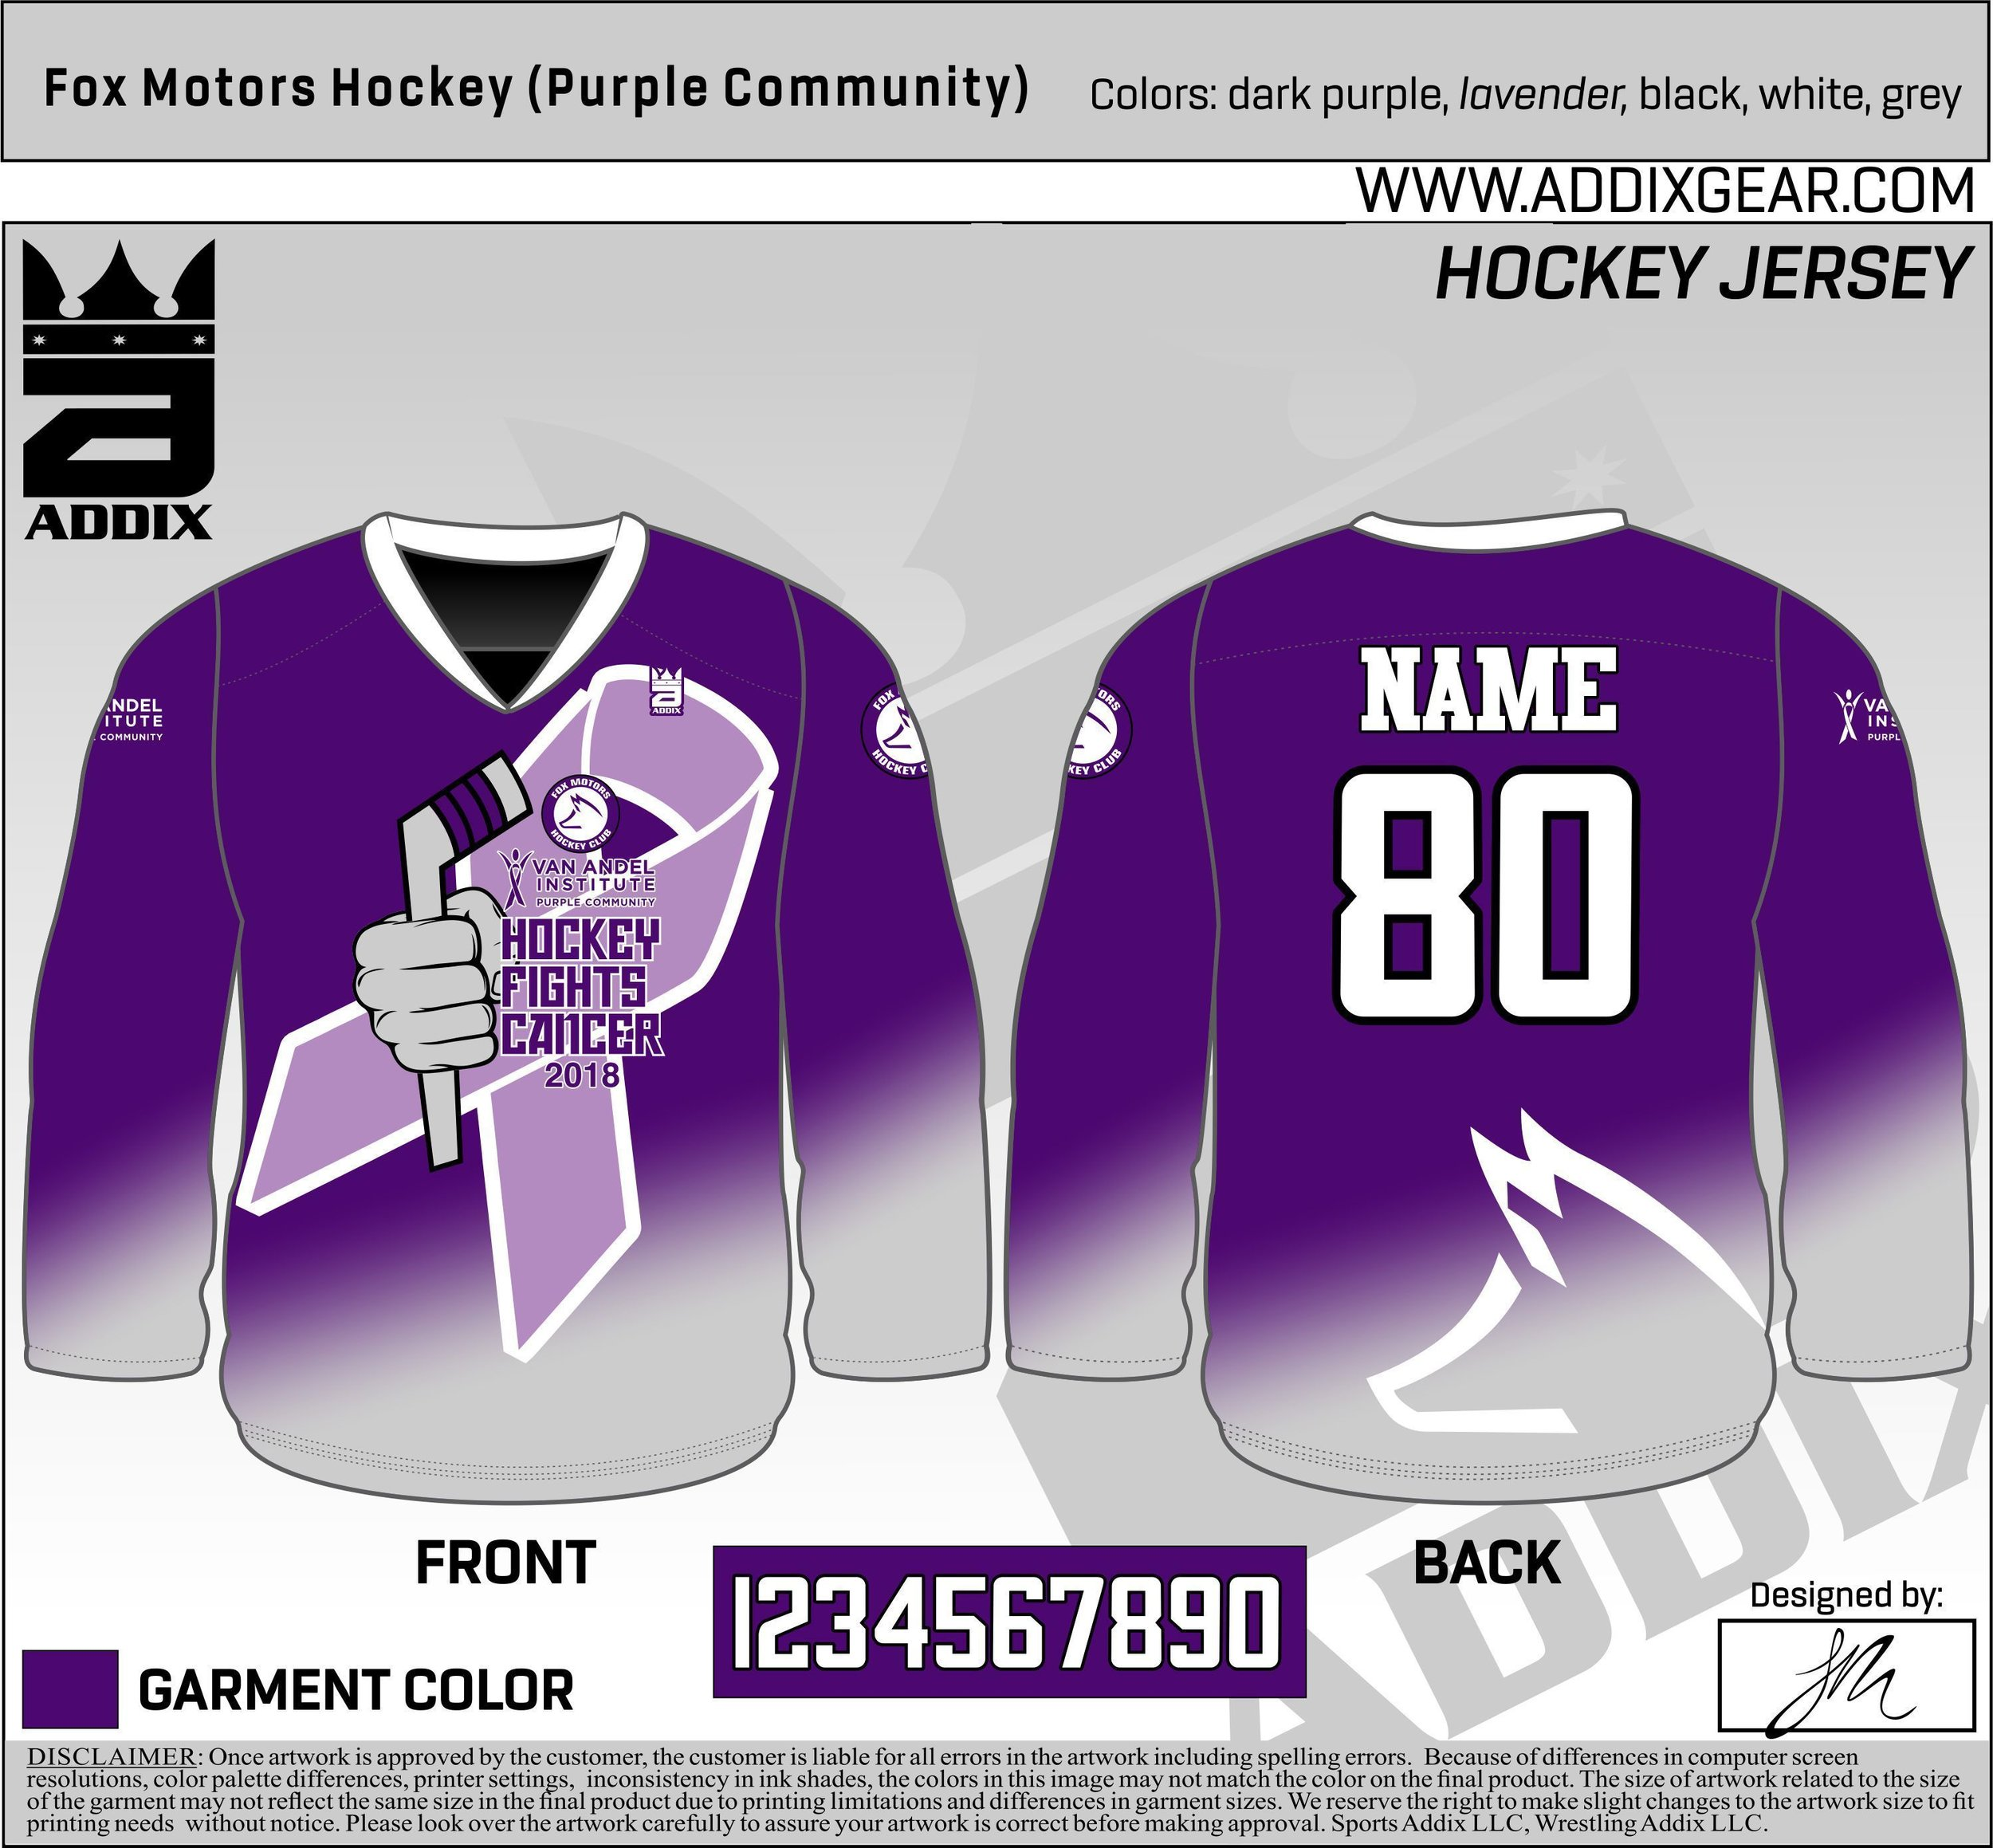 Fox Motors Hockey (Purple Community) _2018_hockey jersey_LM_1-4_- (2) (1).jpg